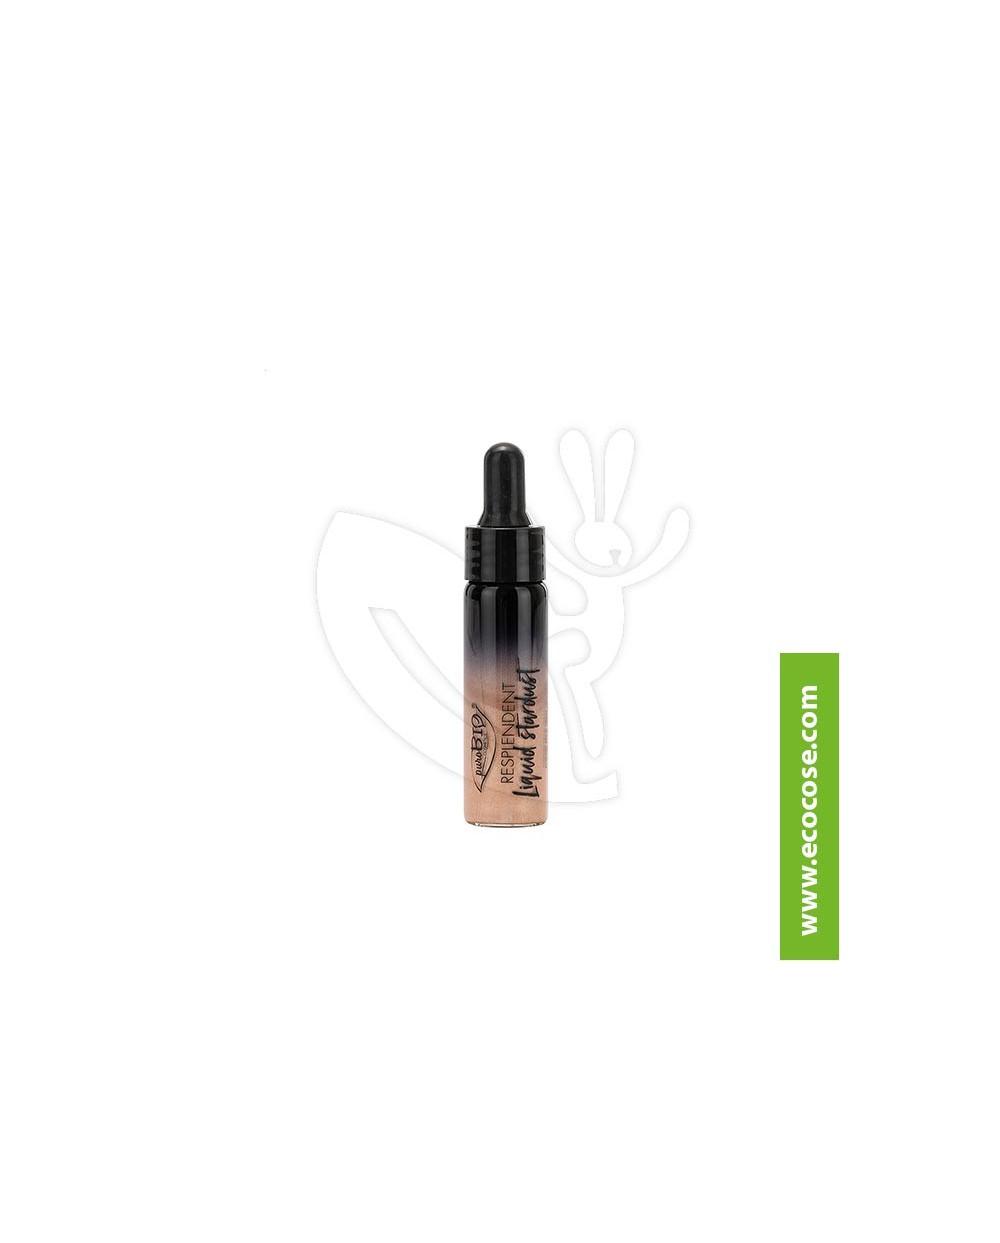 PuroBIO Cosmetics - Resplendent - Liquid Stardust highlighter 01 Champagne